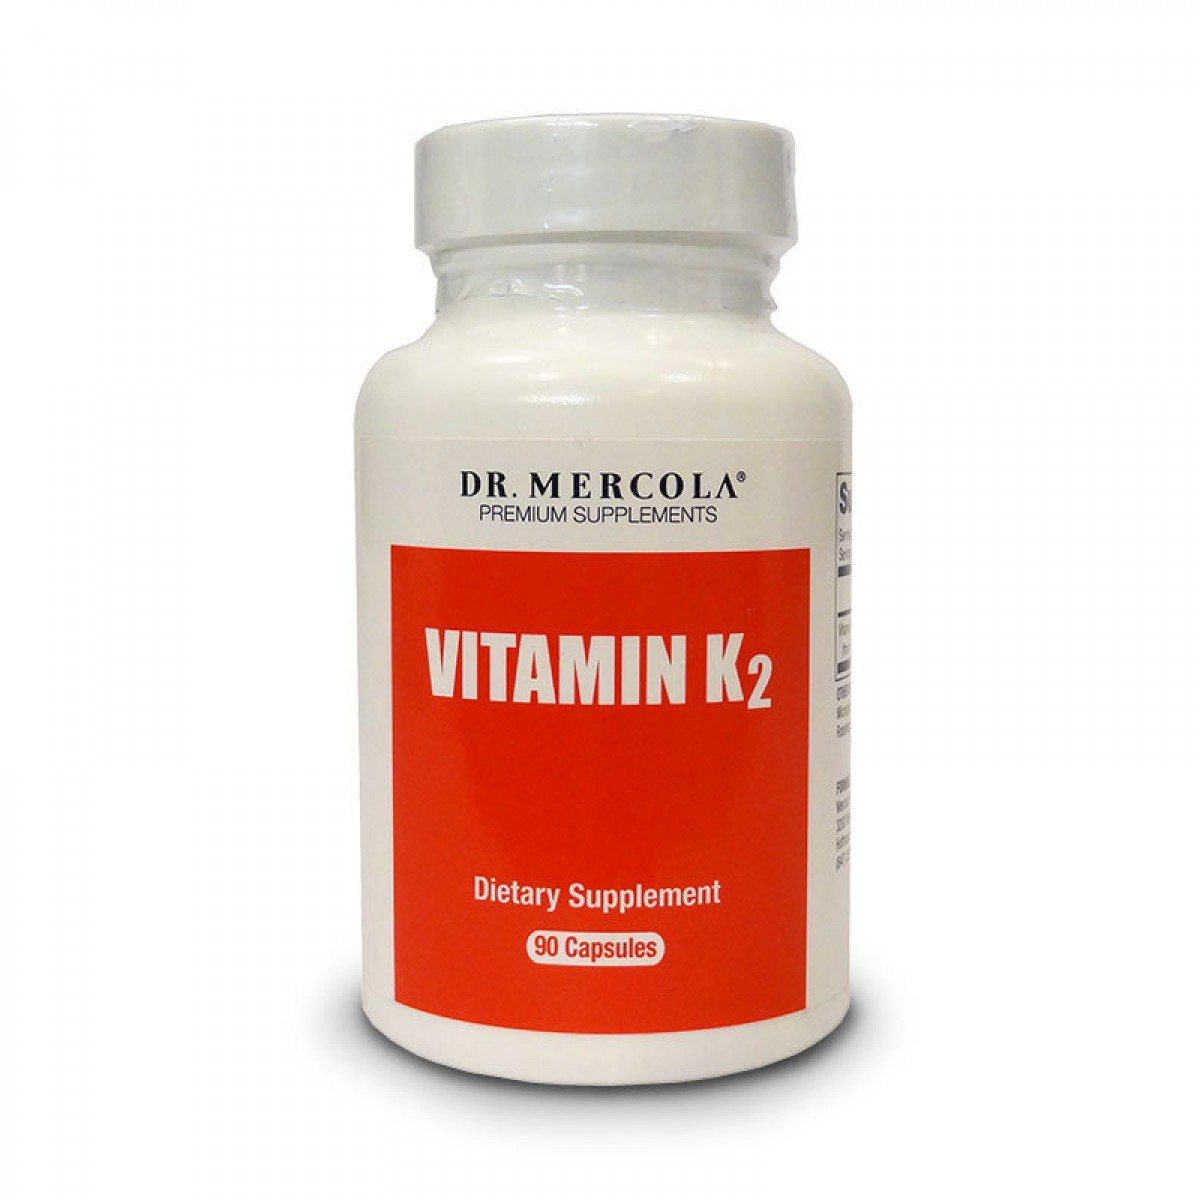 Dr Mercola Vitamin K2 Capsules Fermented Chickpea